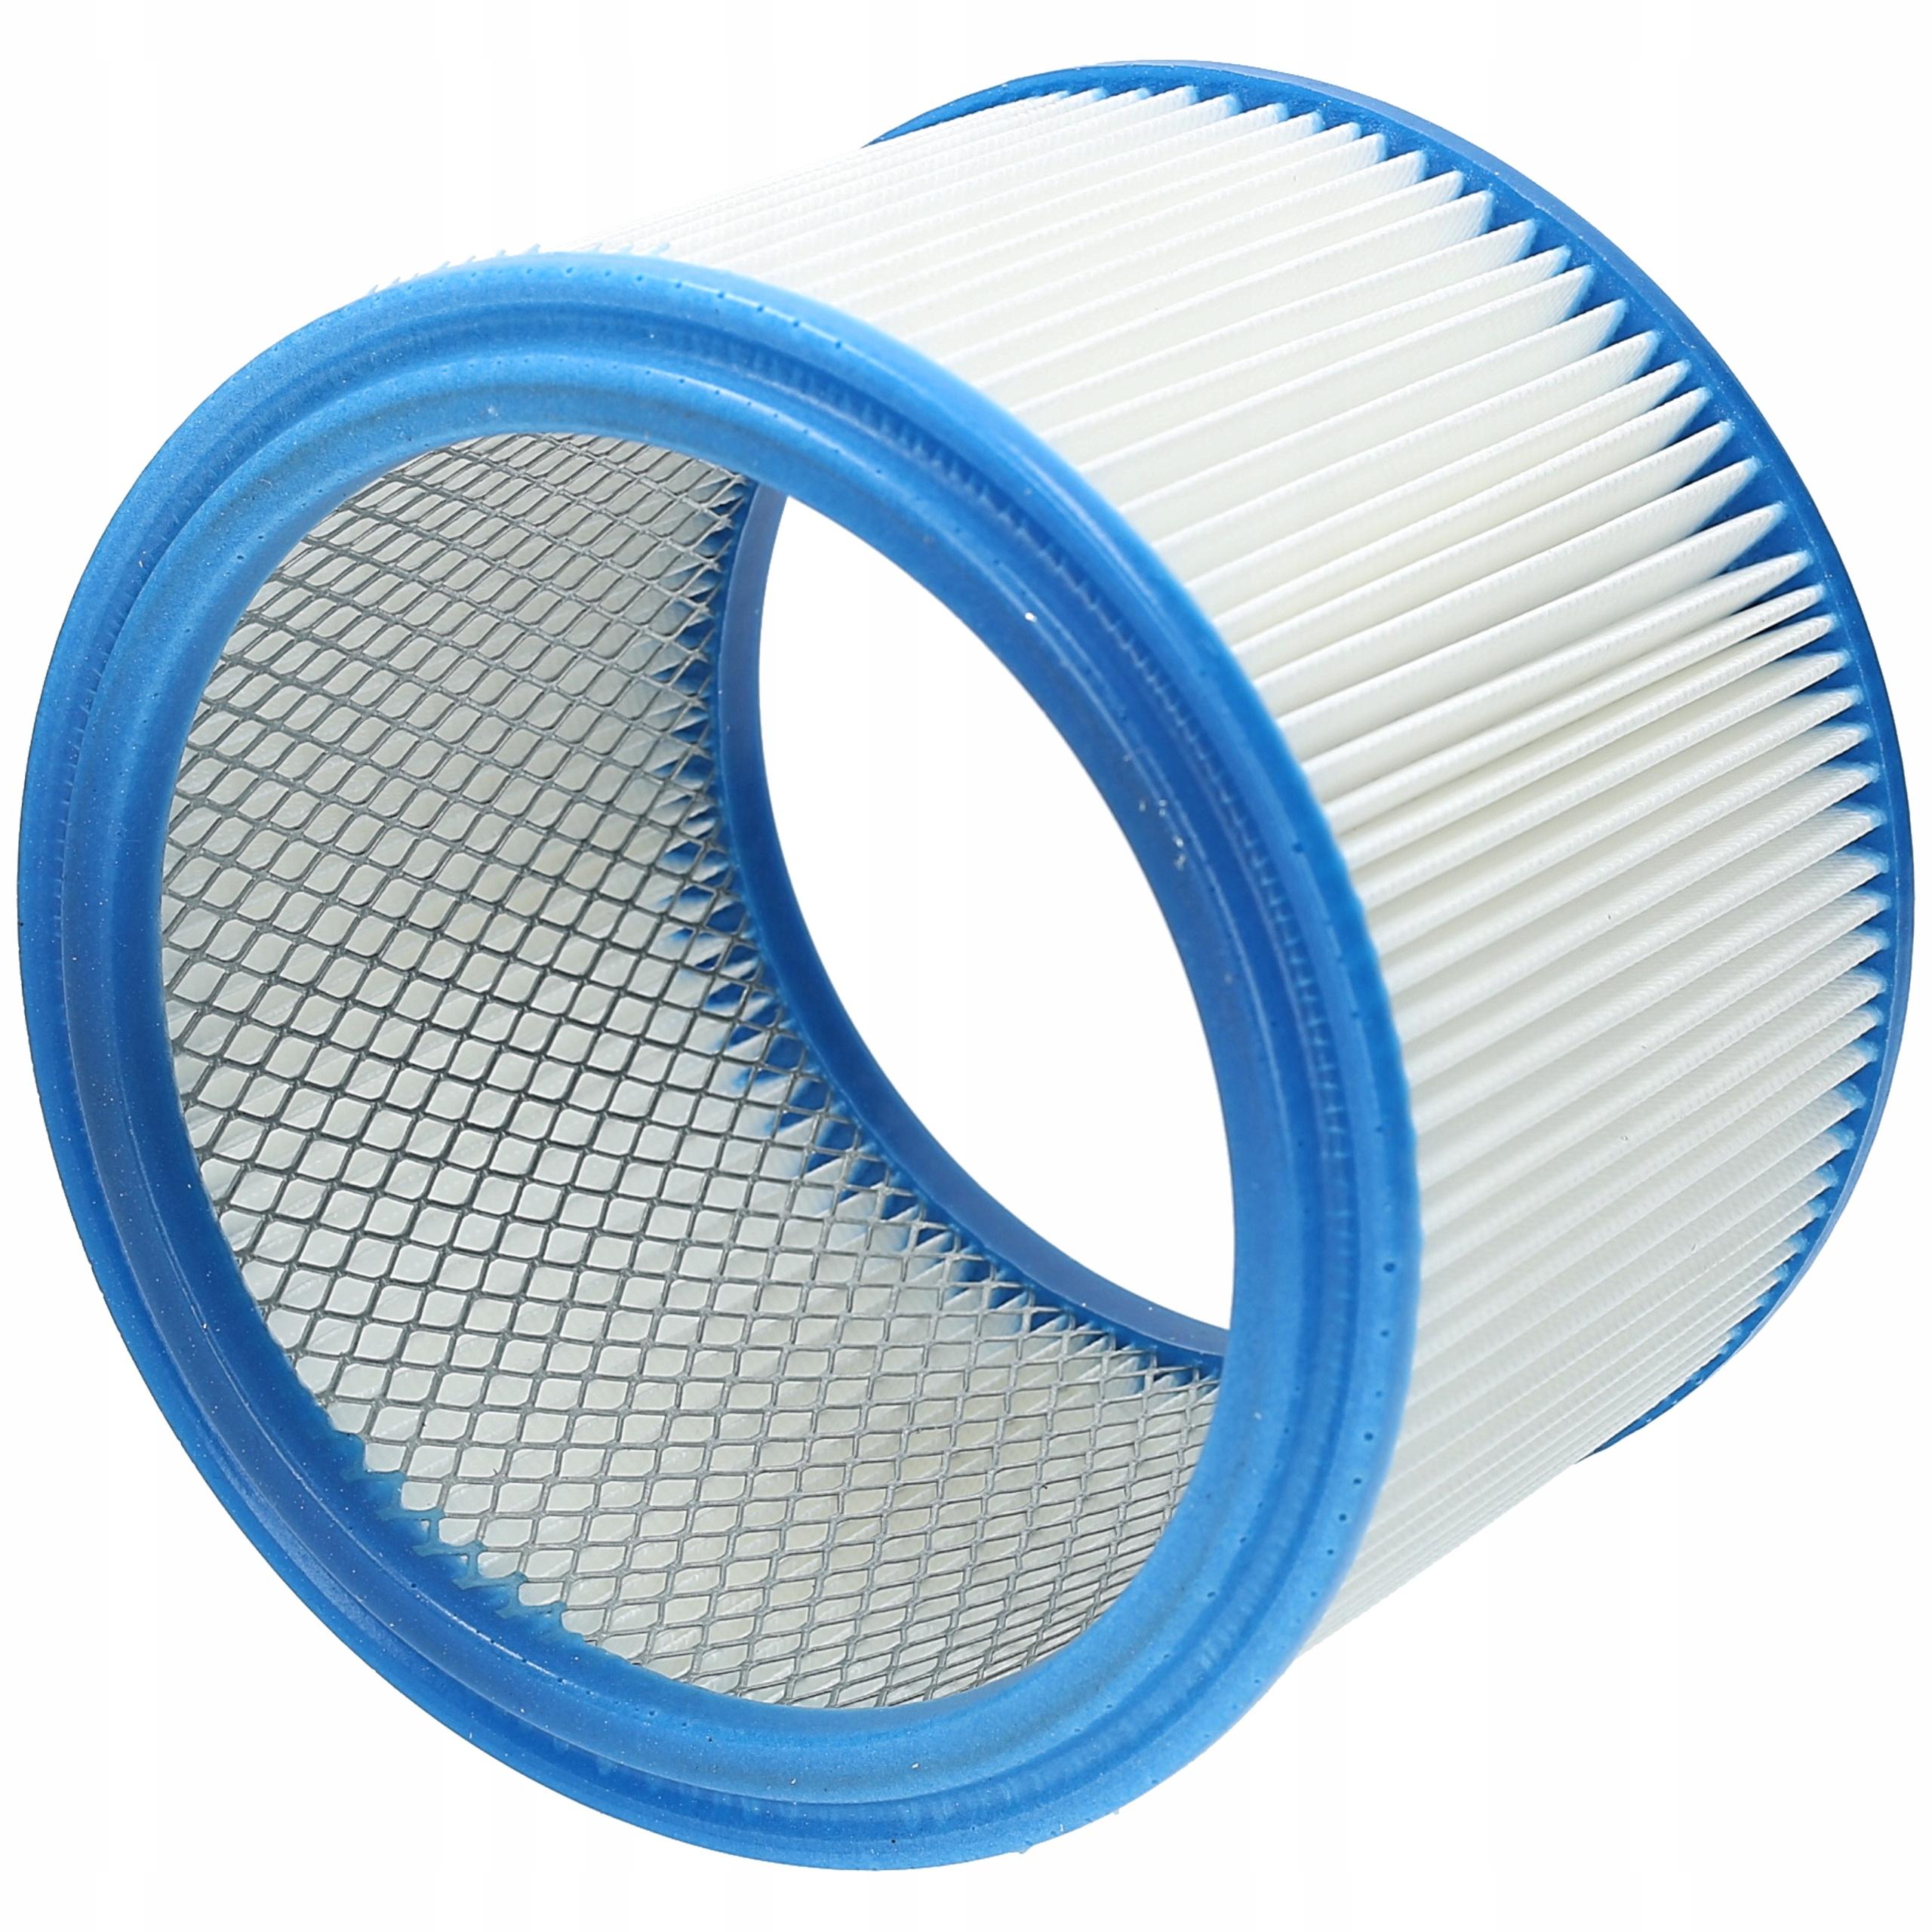 Kónický filter pre vysávač Sparky VC 1430MS